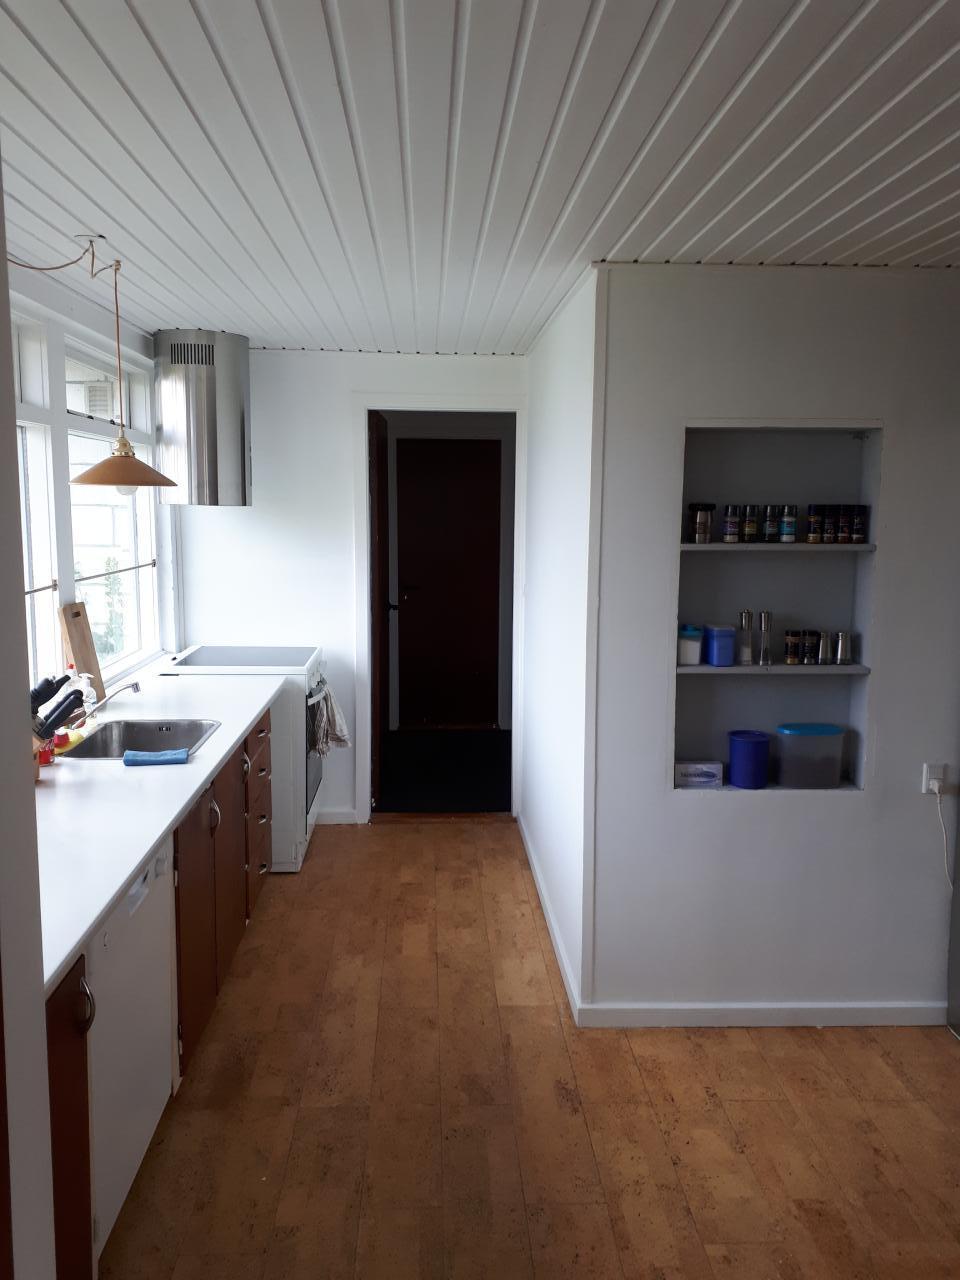 Ferienhaus Tklhus Aeroe (2549744), Ærøskøbing, , Ærø, Dänemark, Bild 10